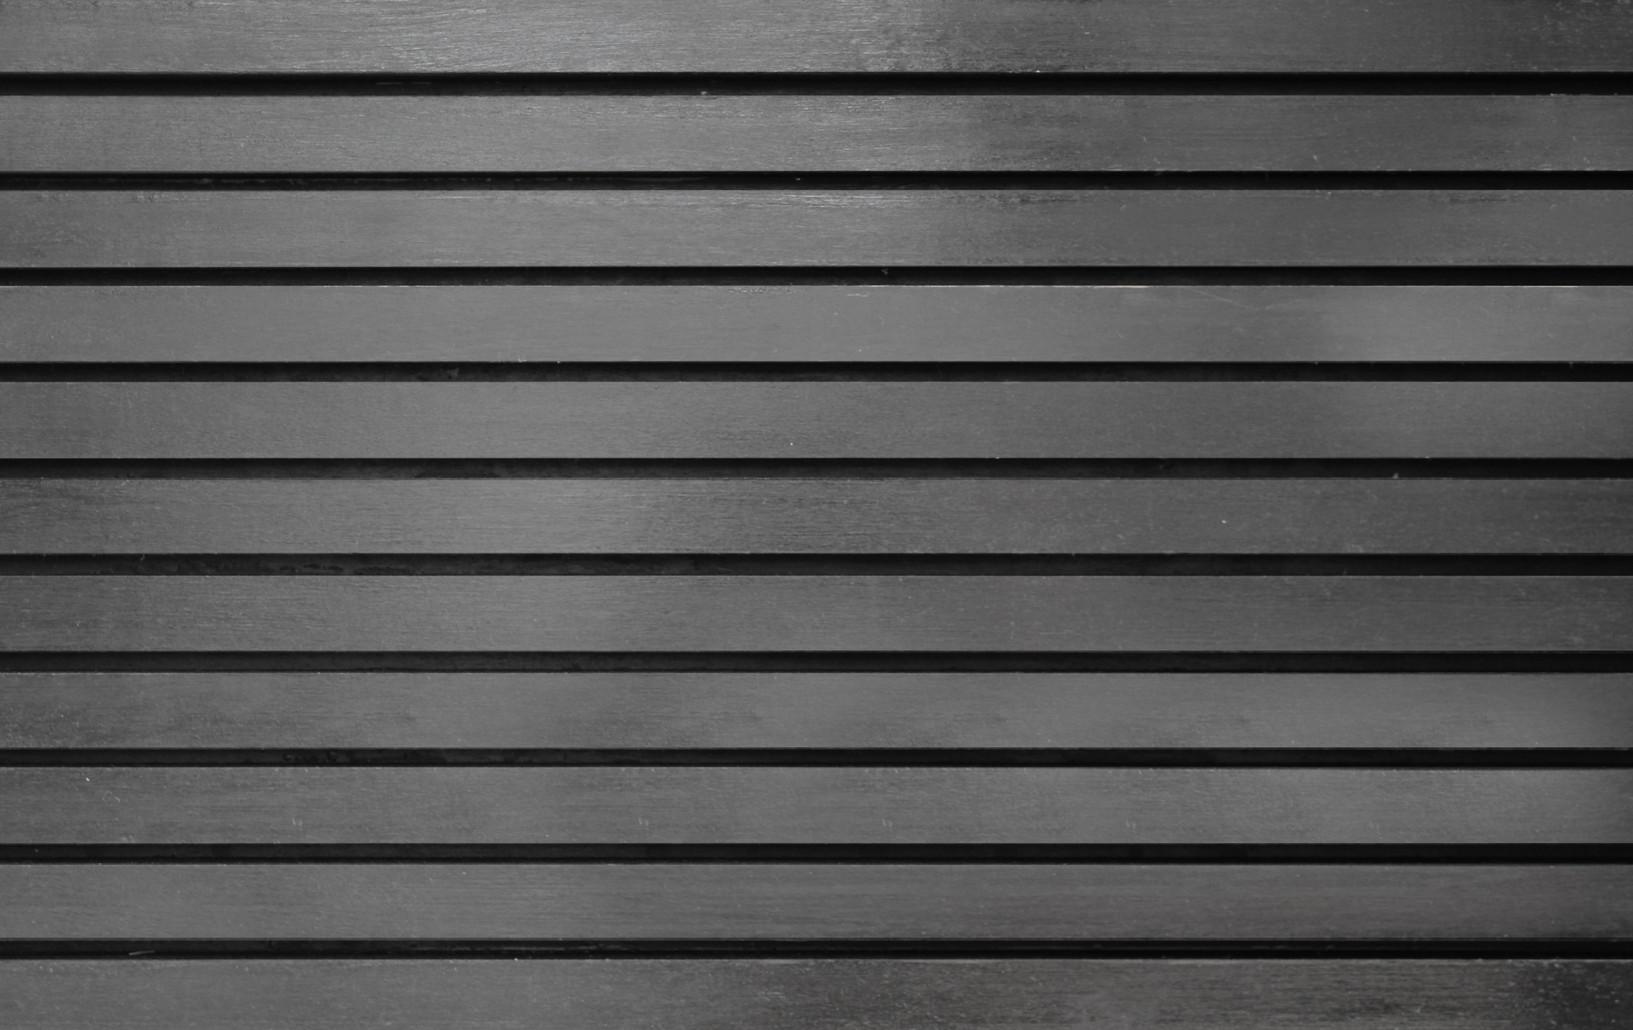 da vinci_wood cabinet slats.jpg